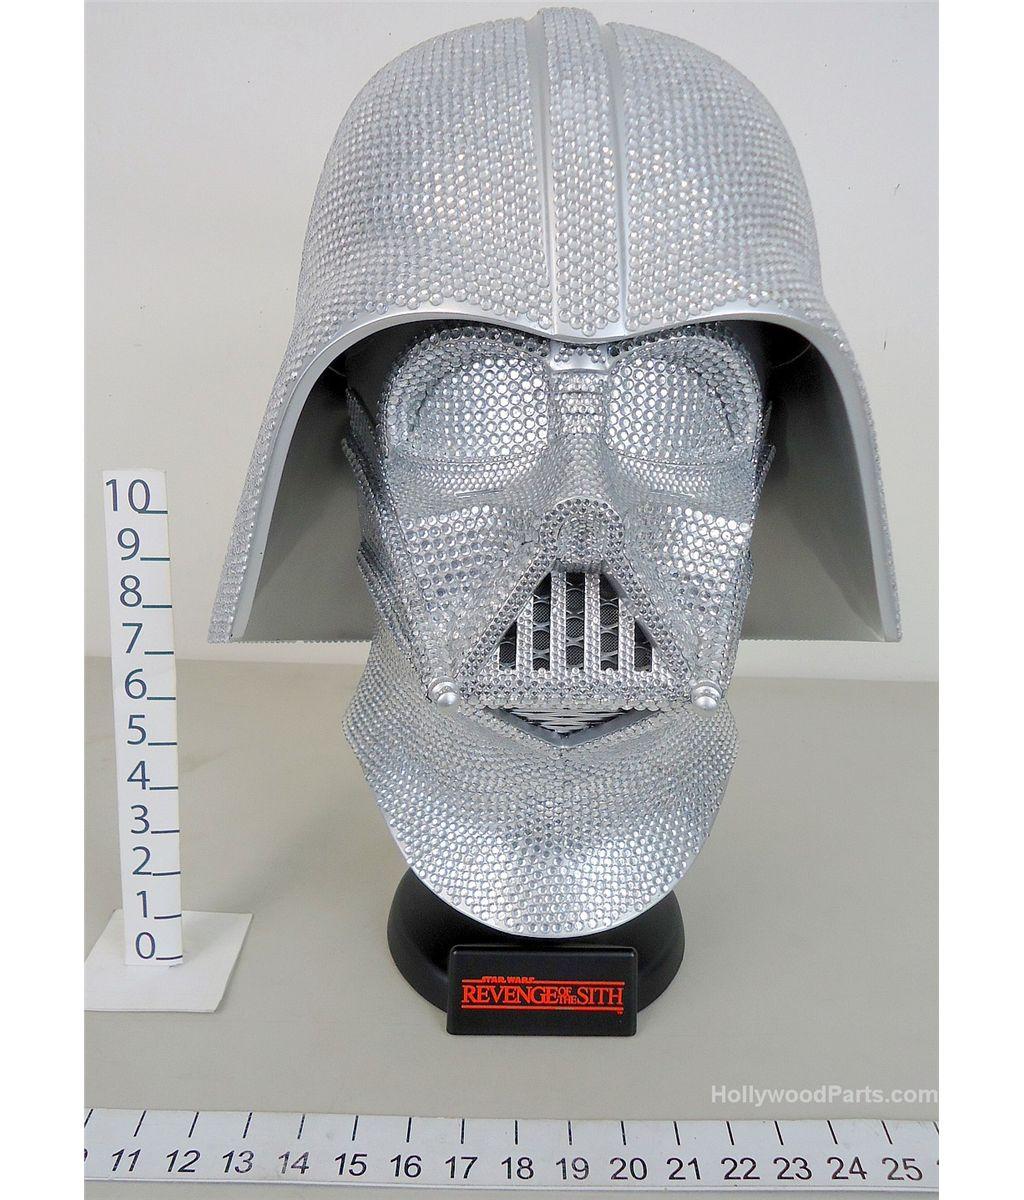 Star Wars Revenge Of The Sith Darth Vader Helmet Bedazzled Swarovski Crystal By Morpheus